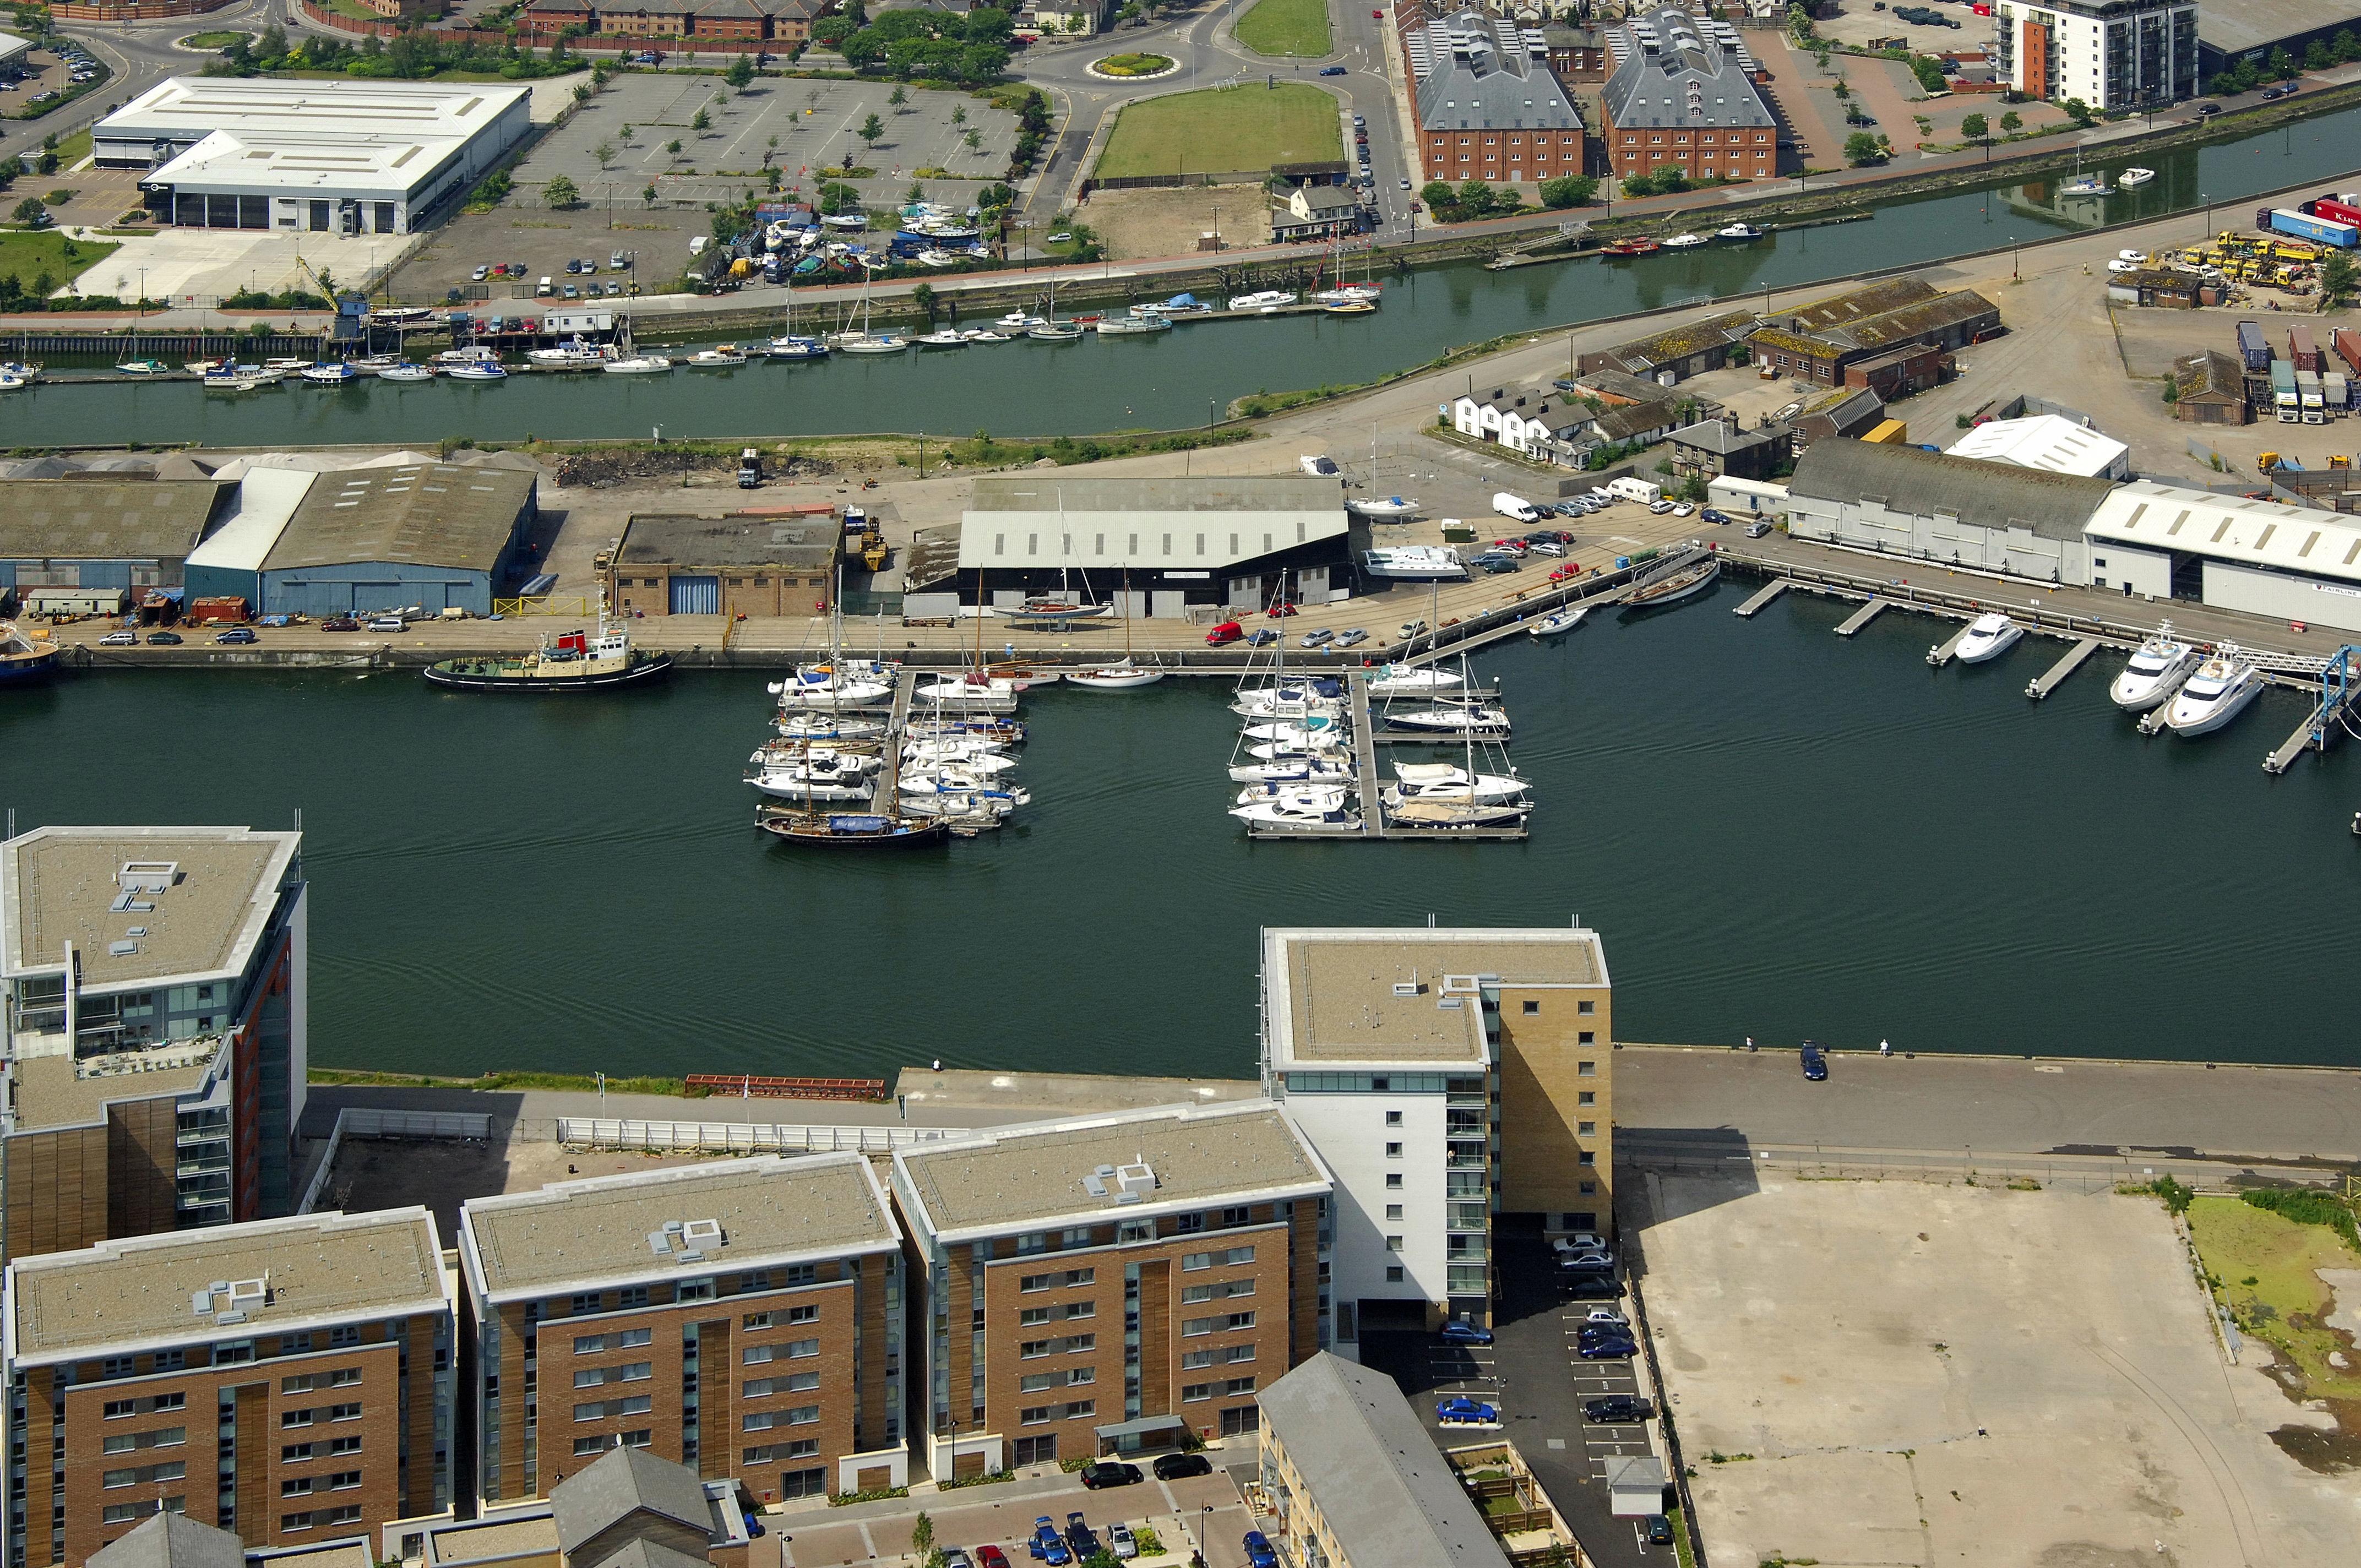 spirit yachts in new cut east  ipswich  suffolk  gb  united kingdom - marina reviews